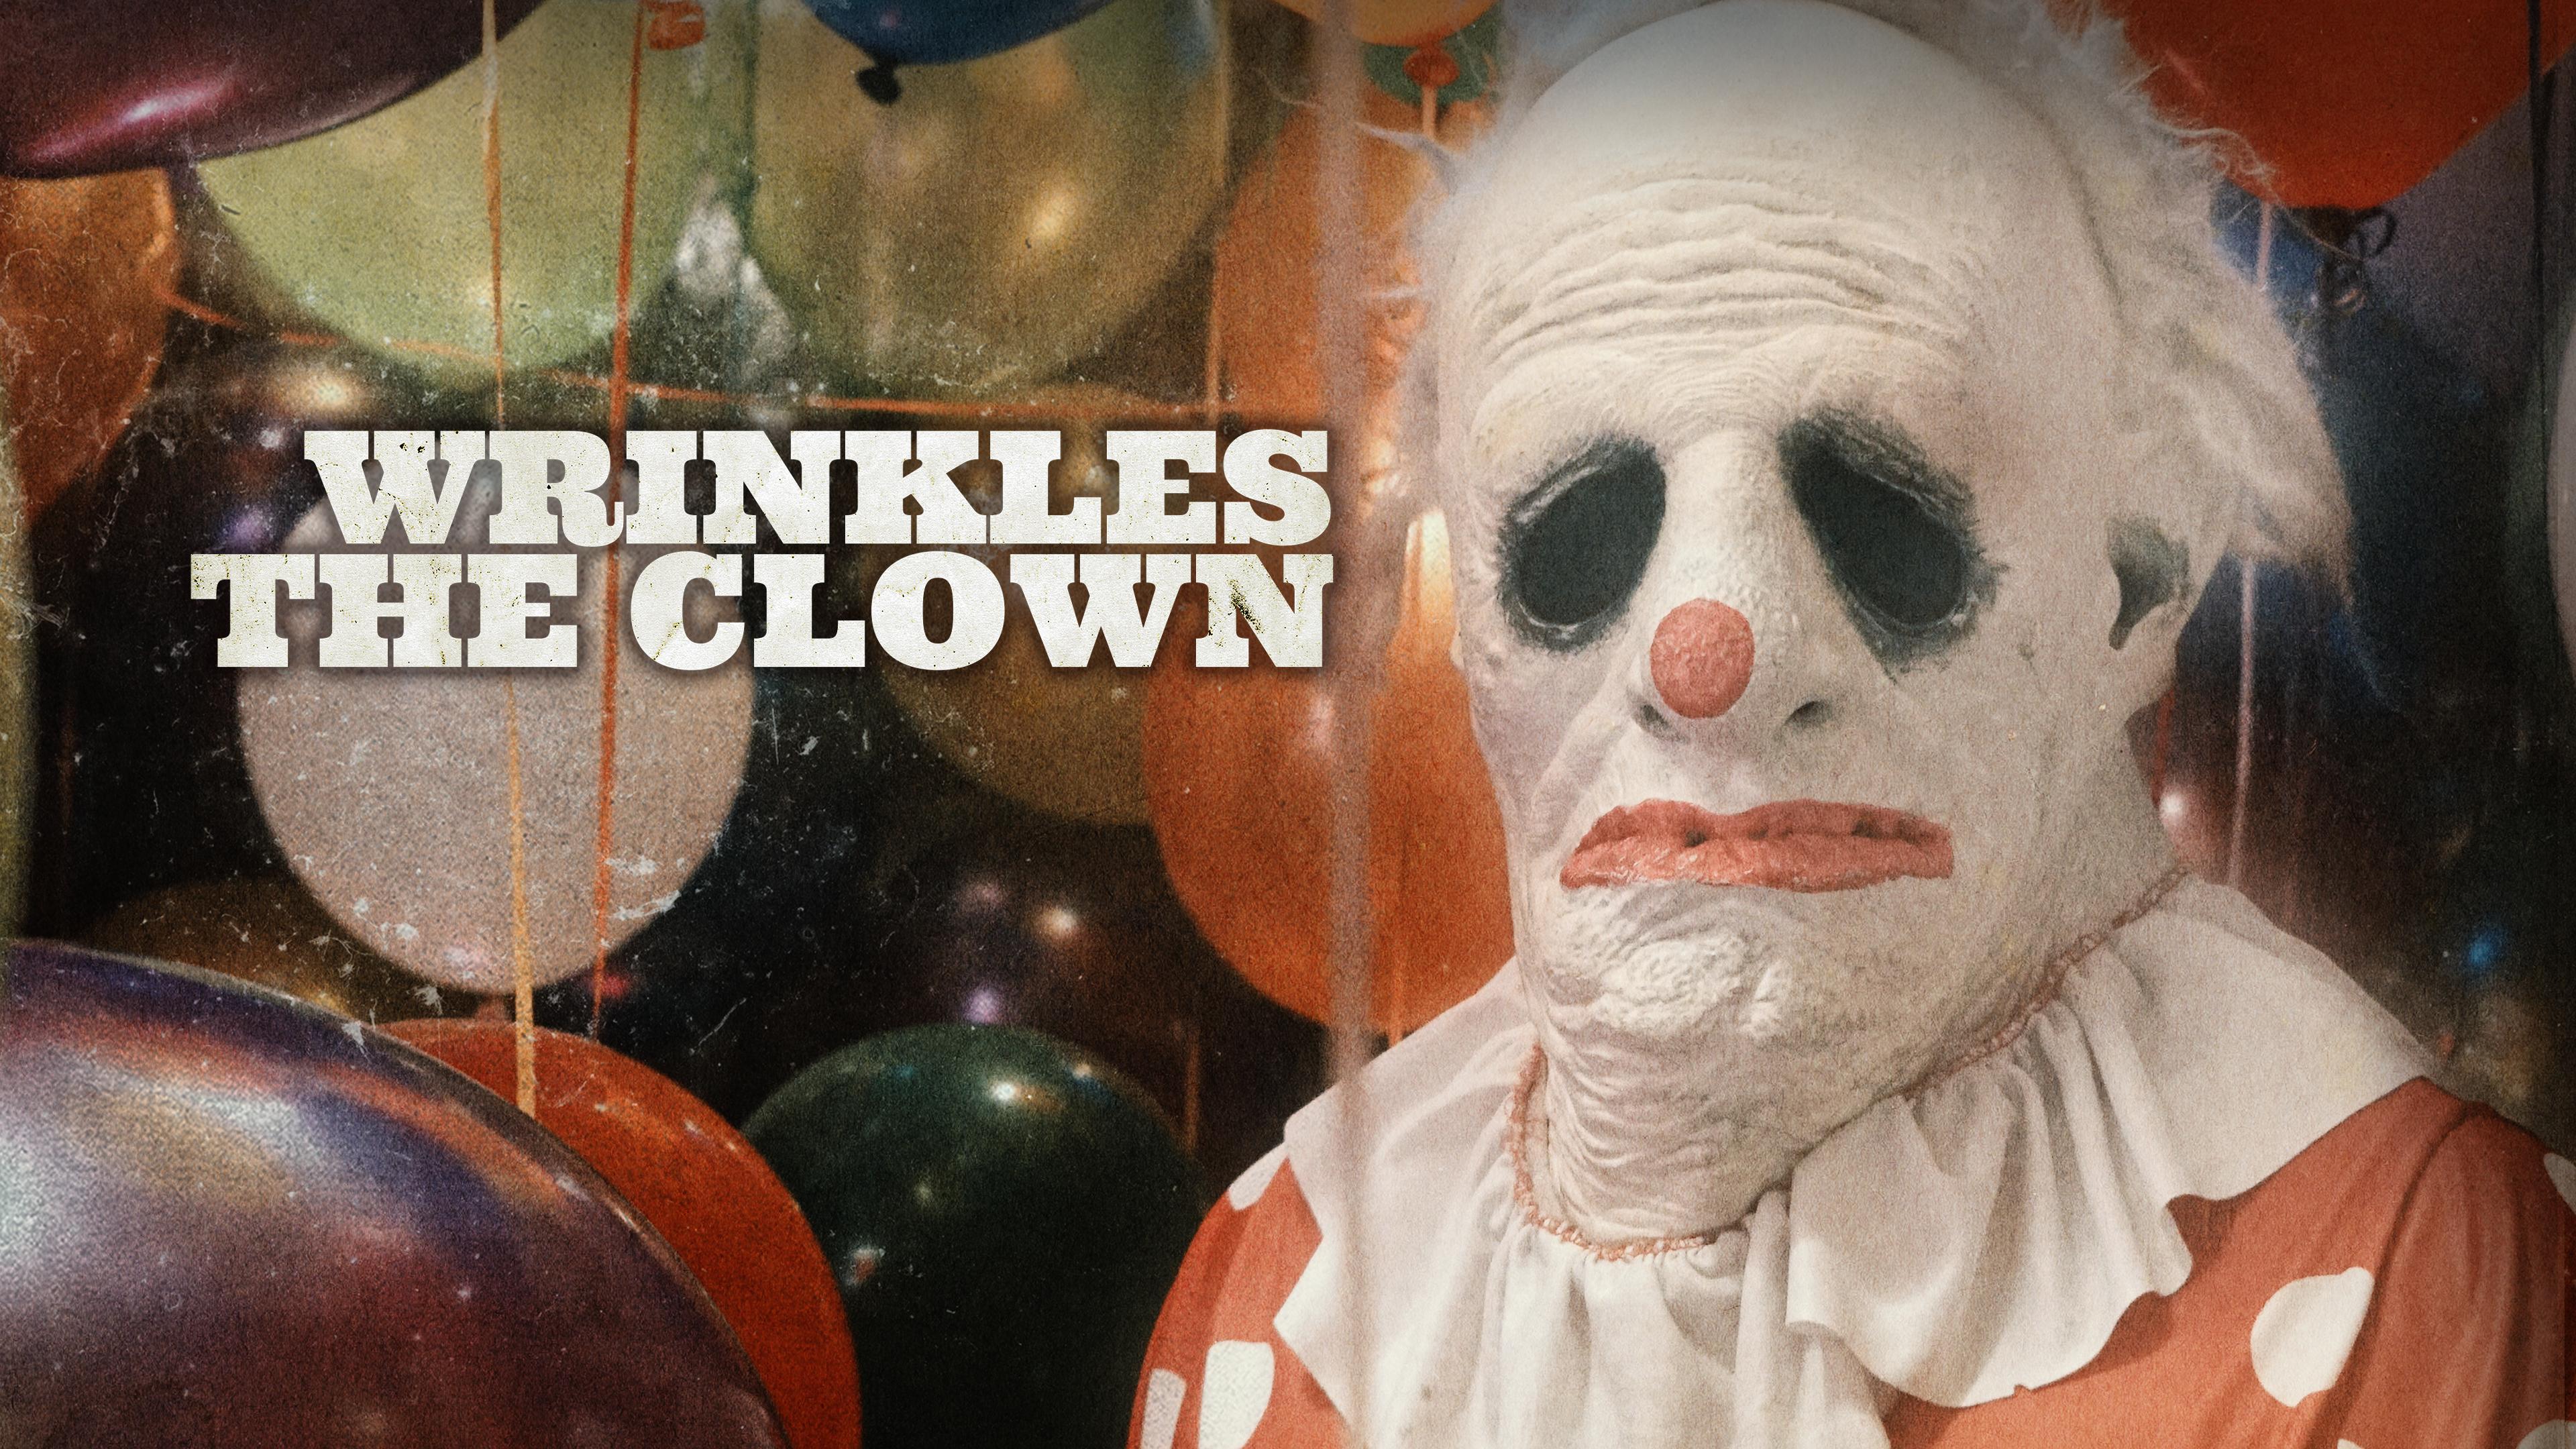 Wrinkles the Clown filmink Presents film